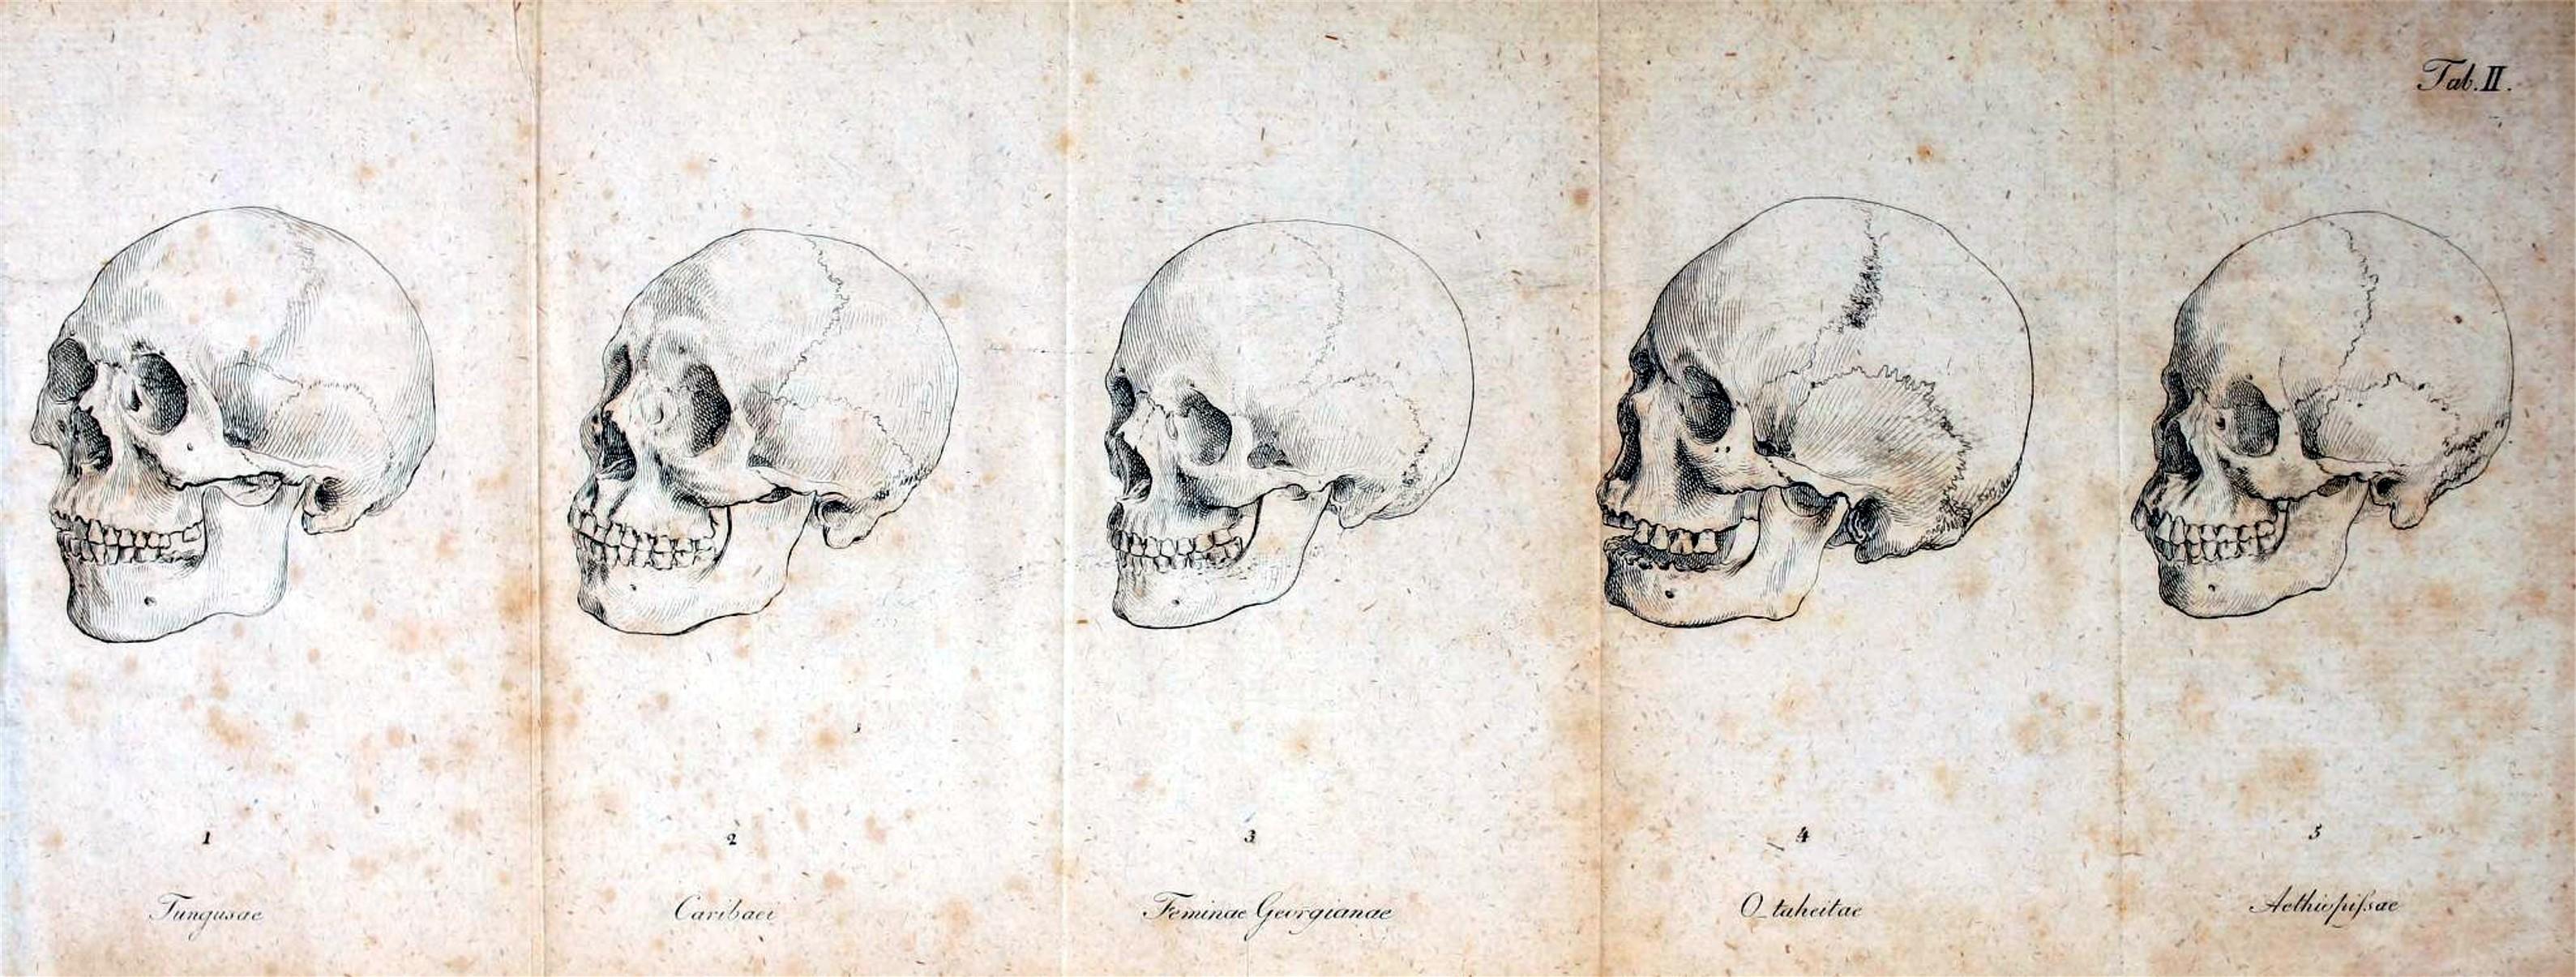 medical-anatomy-skull-2